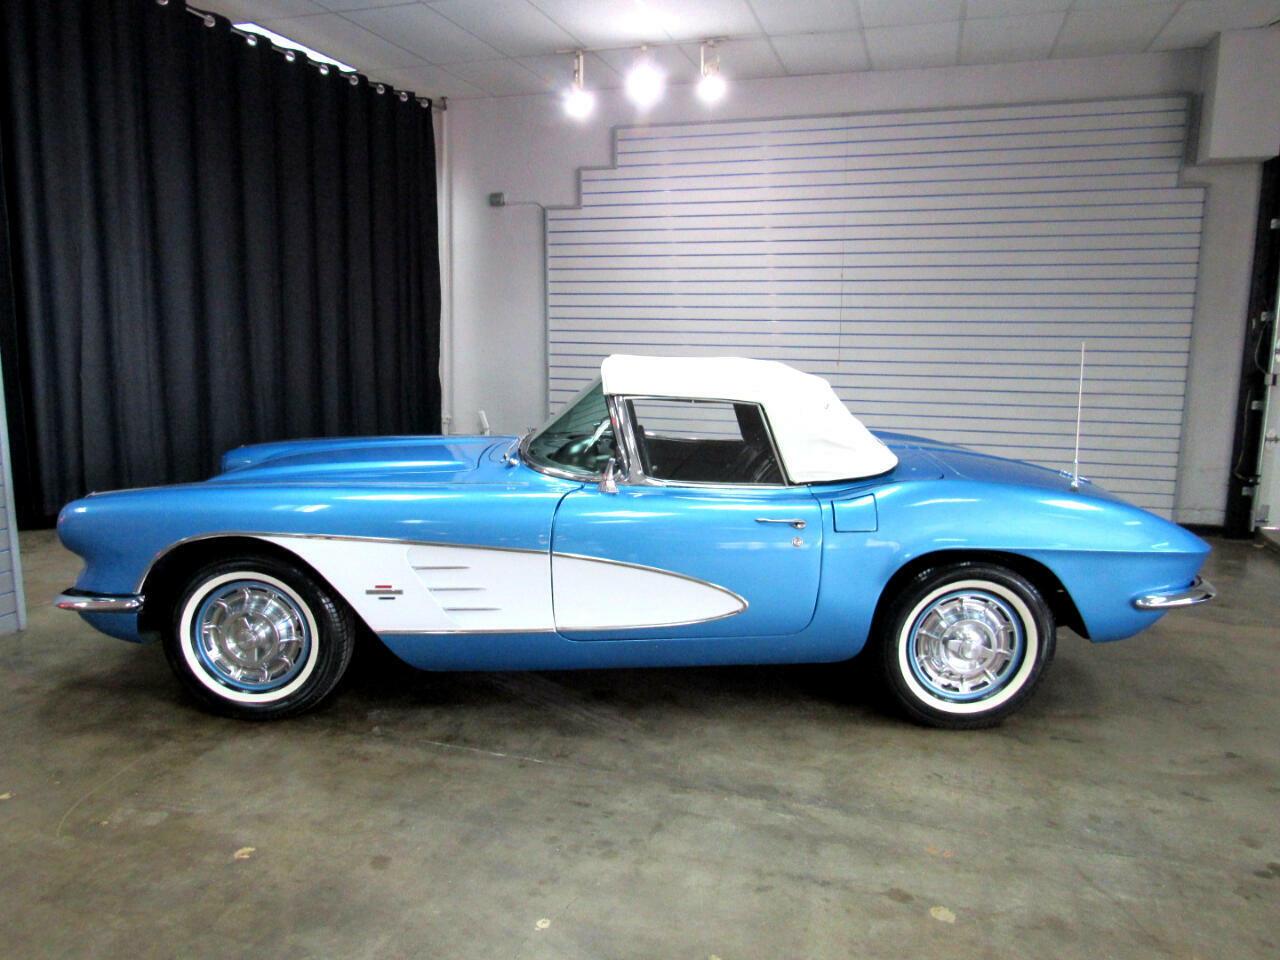 1961 Blue Chevrolet Corvette   | C1 Corvette Photo 3